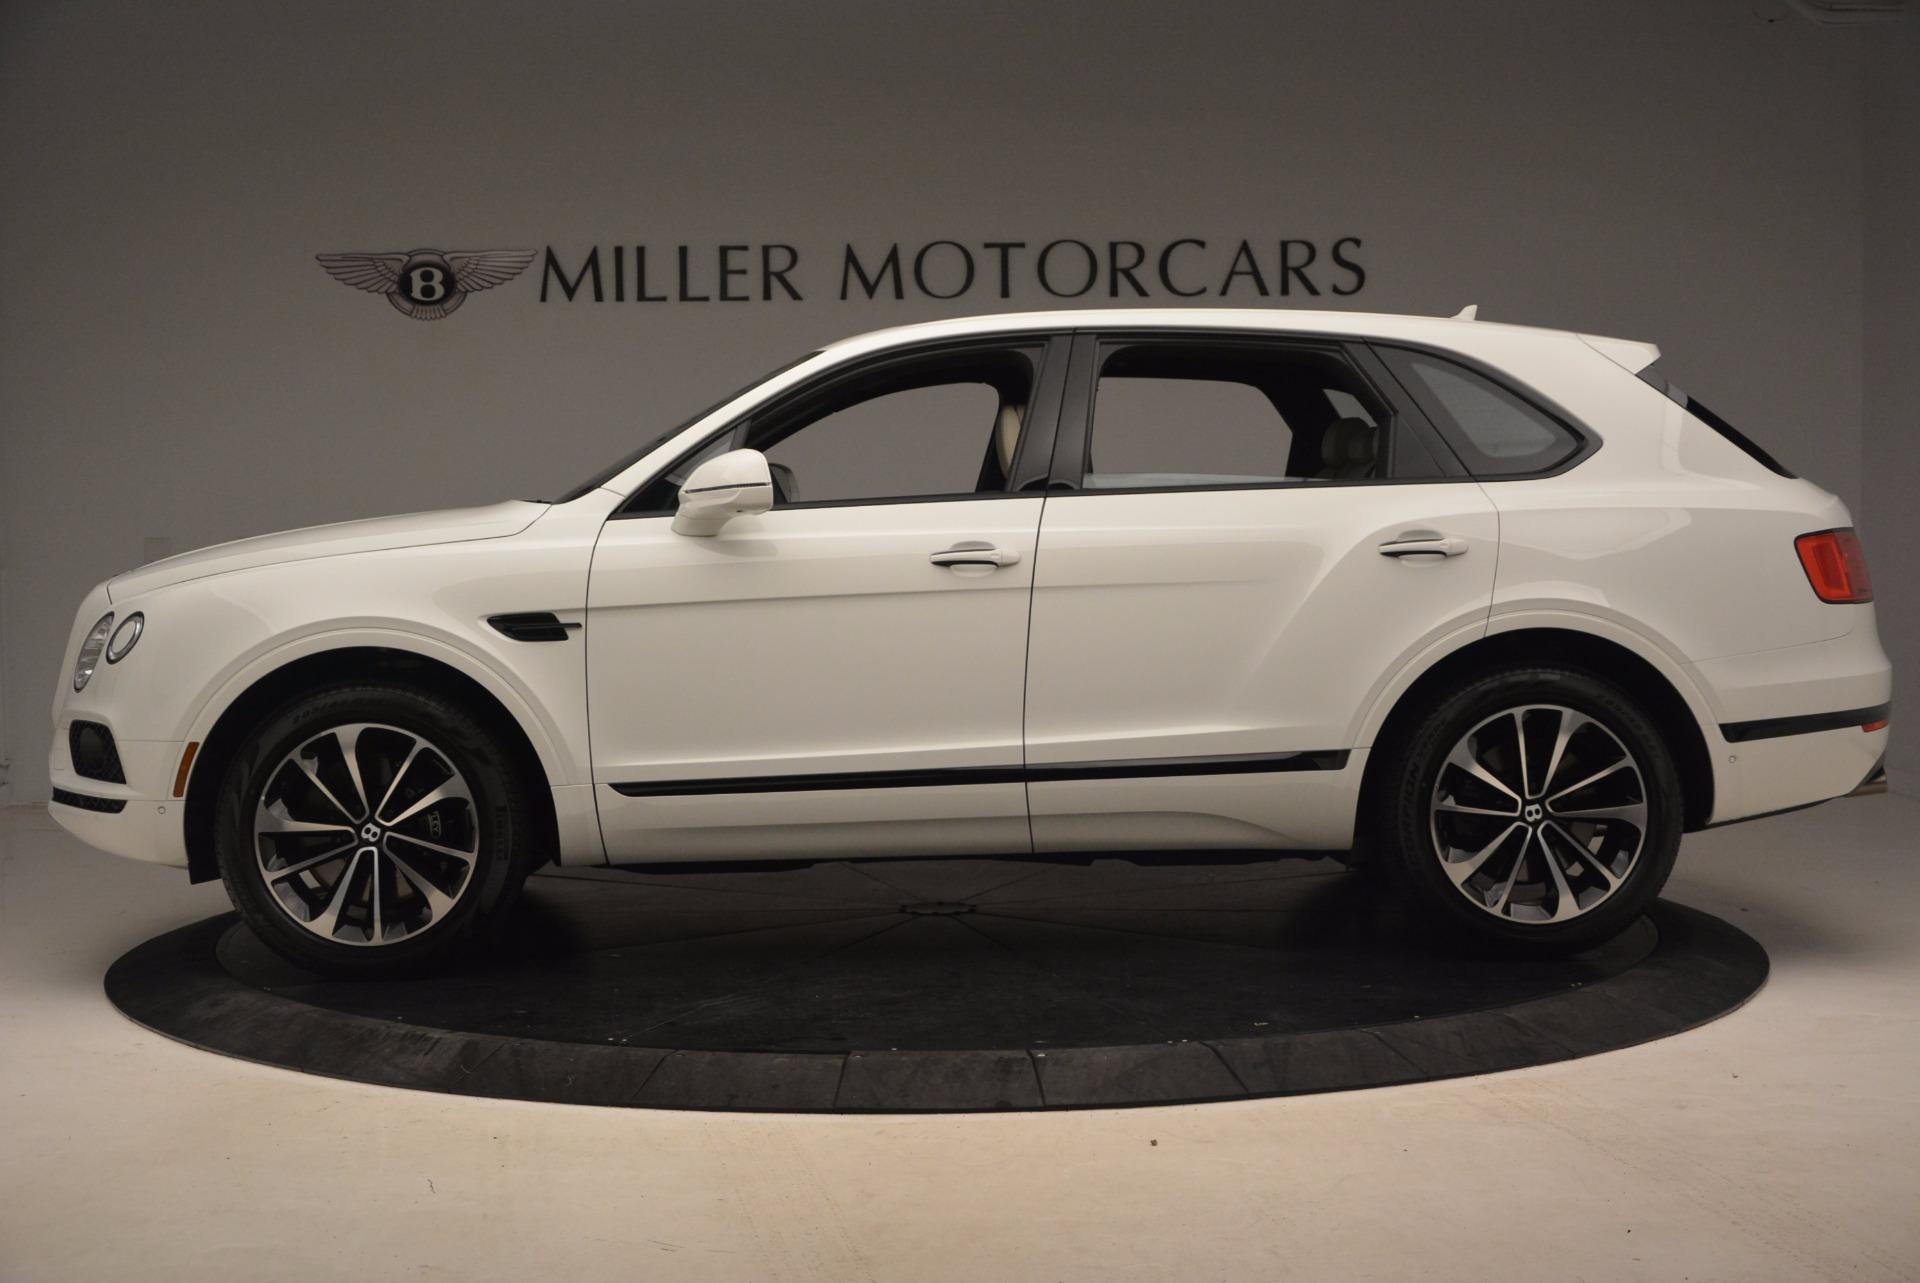 Used 2018 Bentley Bentayga Onyx For Sale In Greenwich, CT. Alfa Romeo of Greenwich, 7485 1549_p3